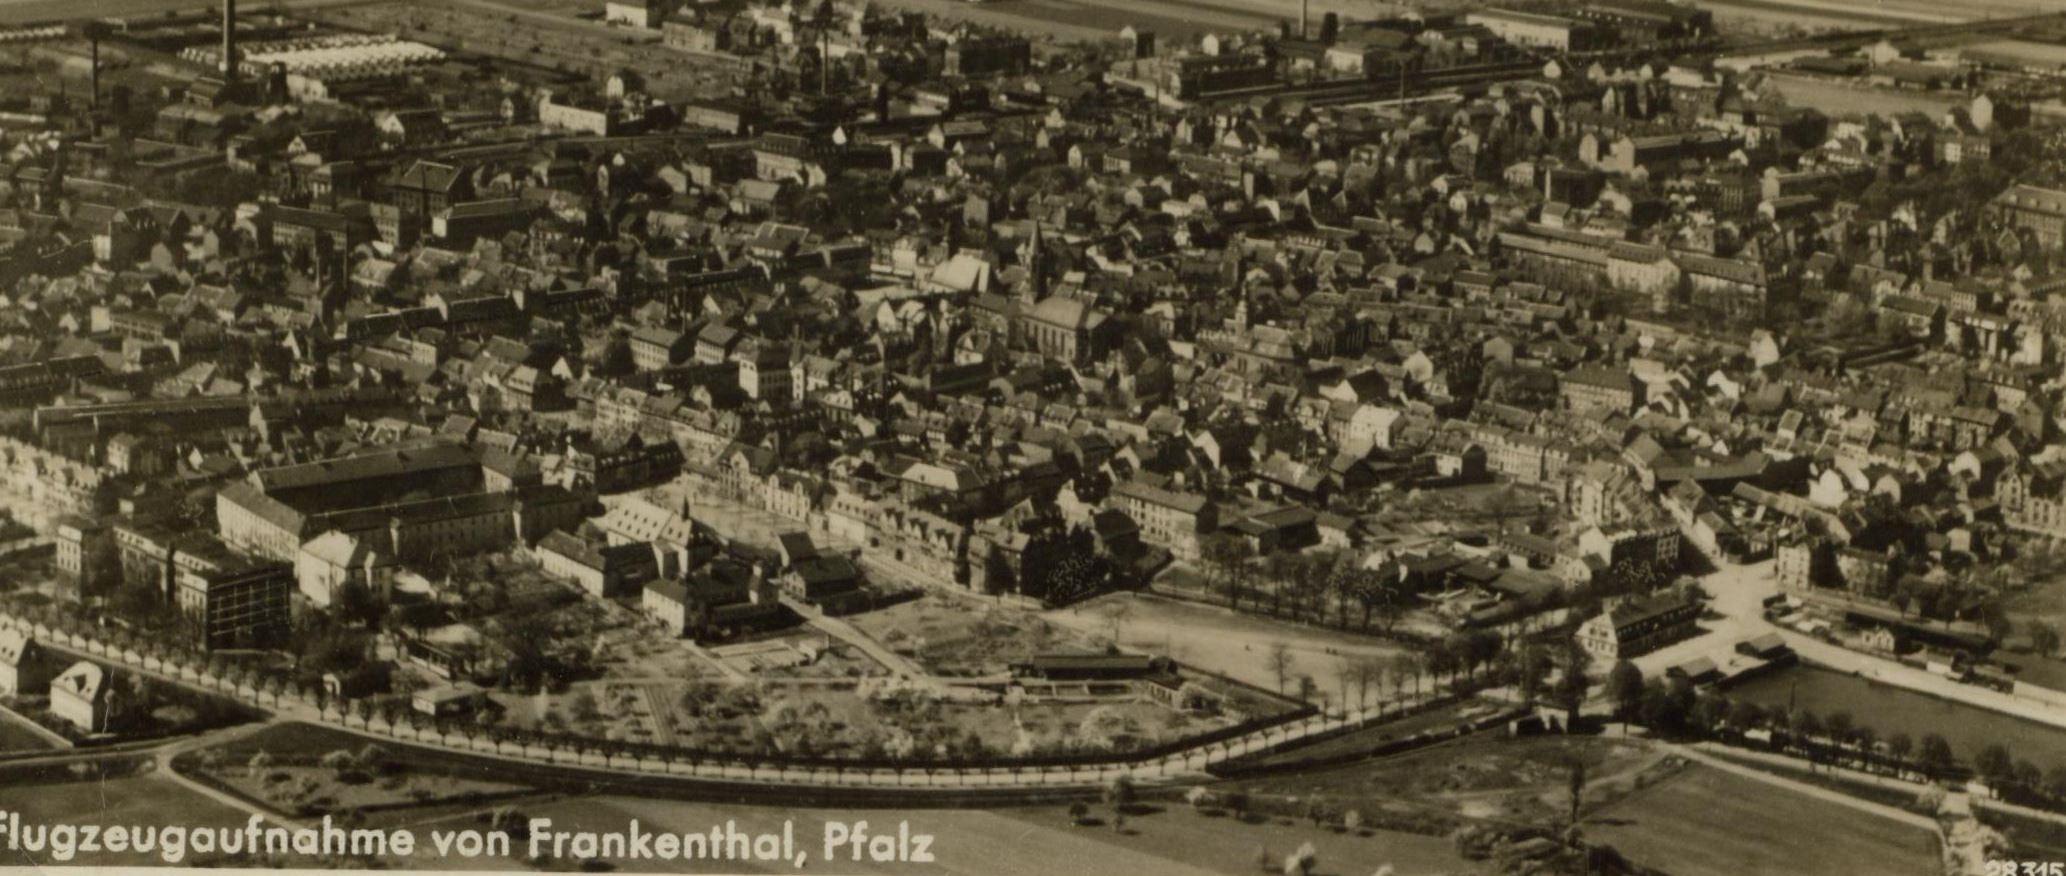 Luftbild-Frankenthal-1935